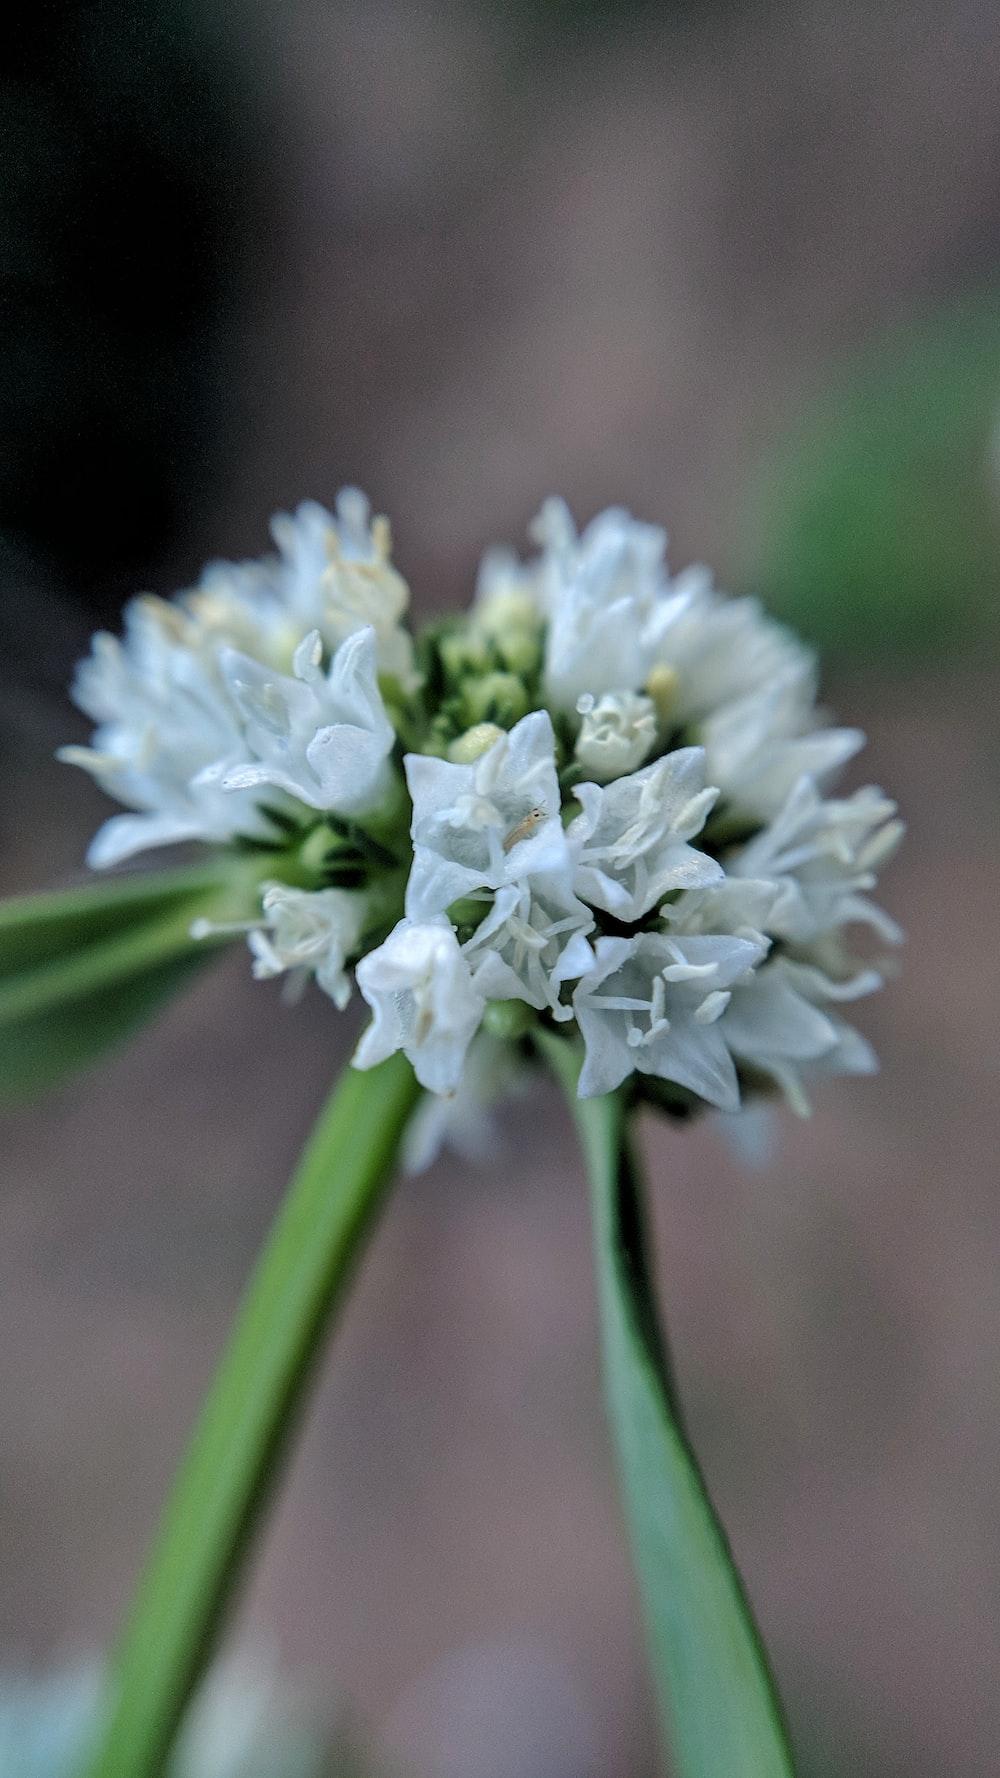 white flower focus photo